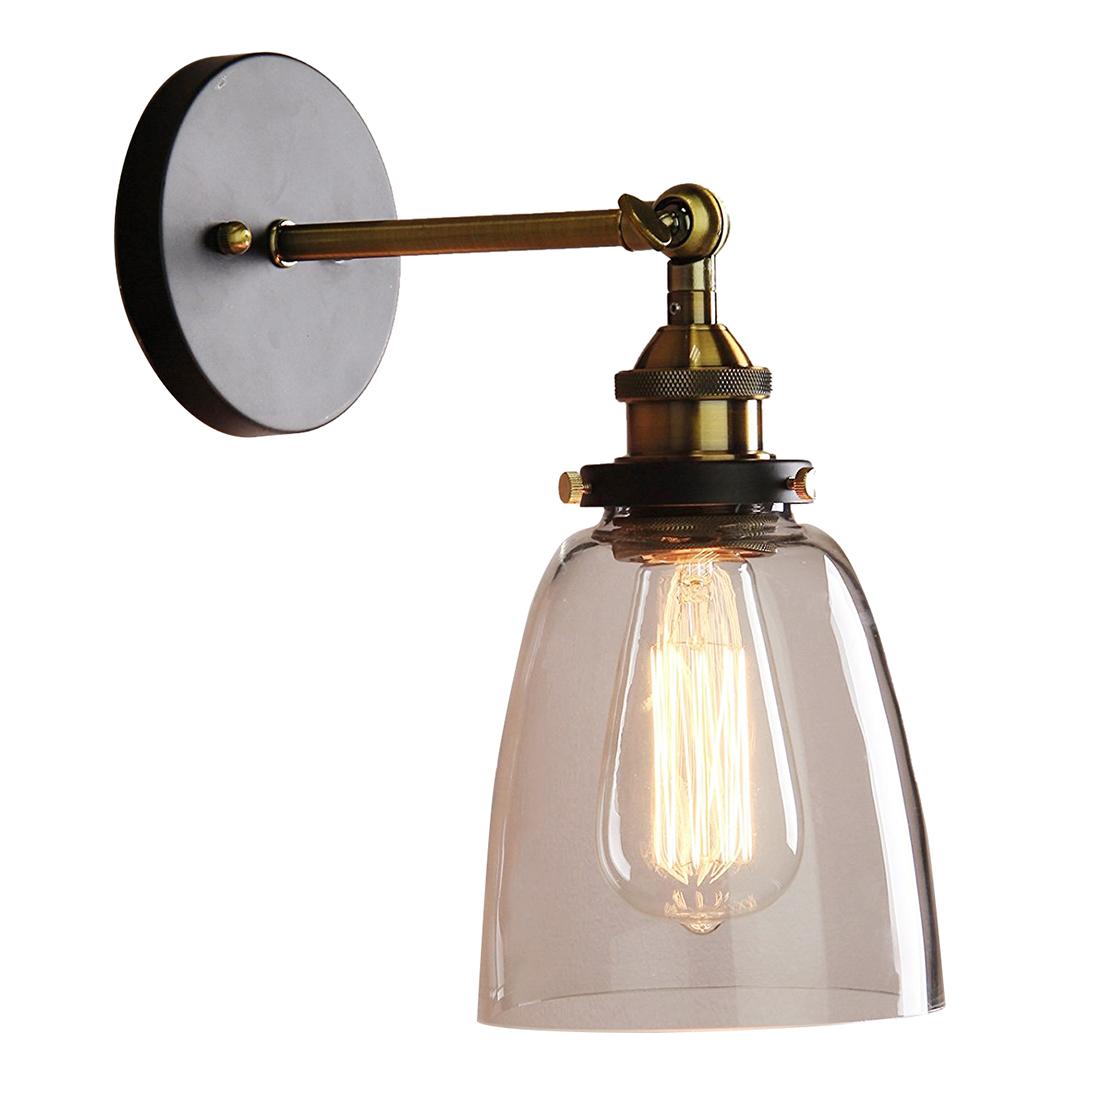 Industrial Edison 1 Light Glass Shade Wall Mount Fixture